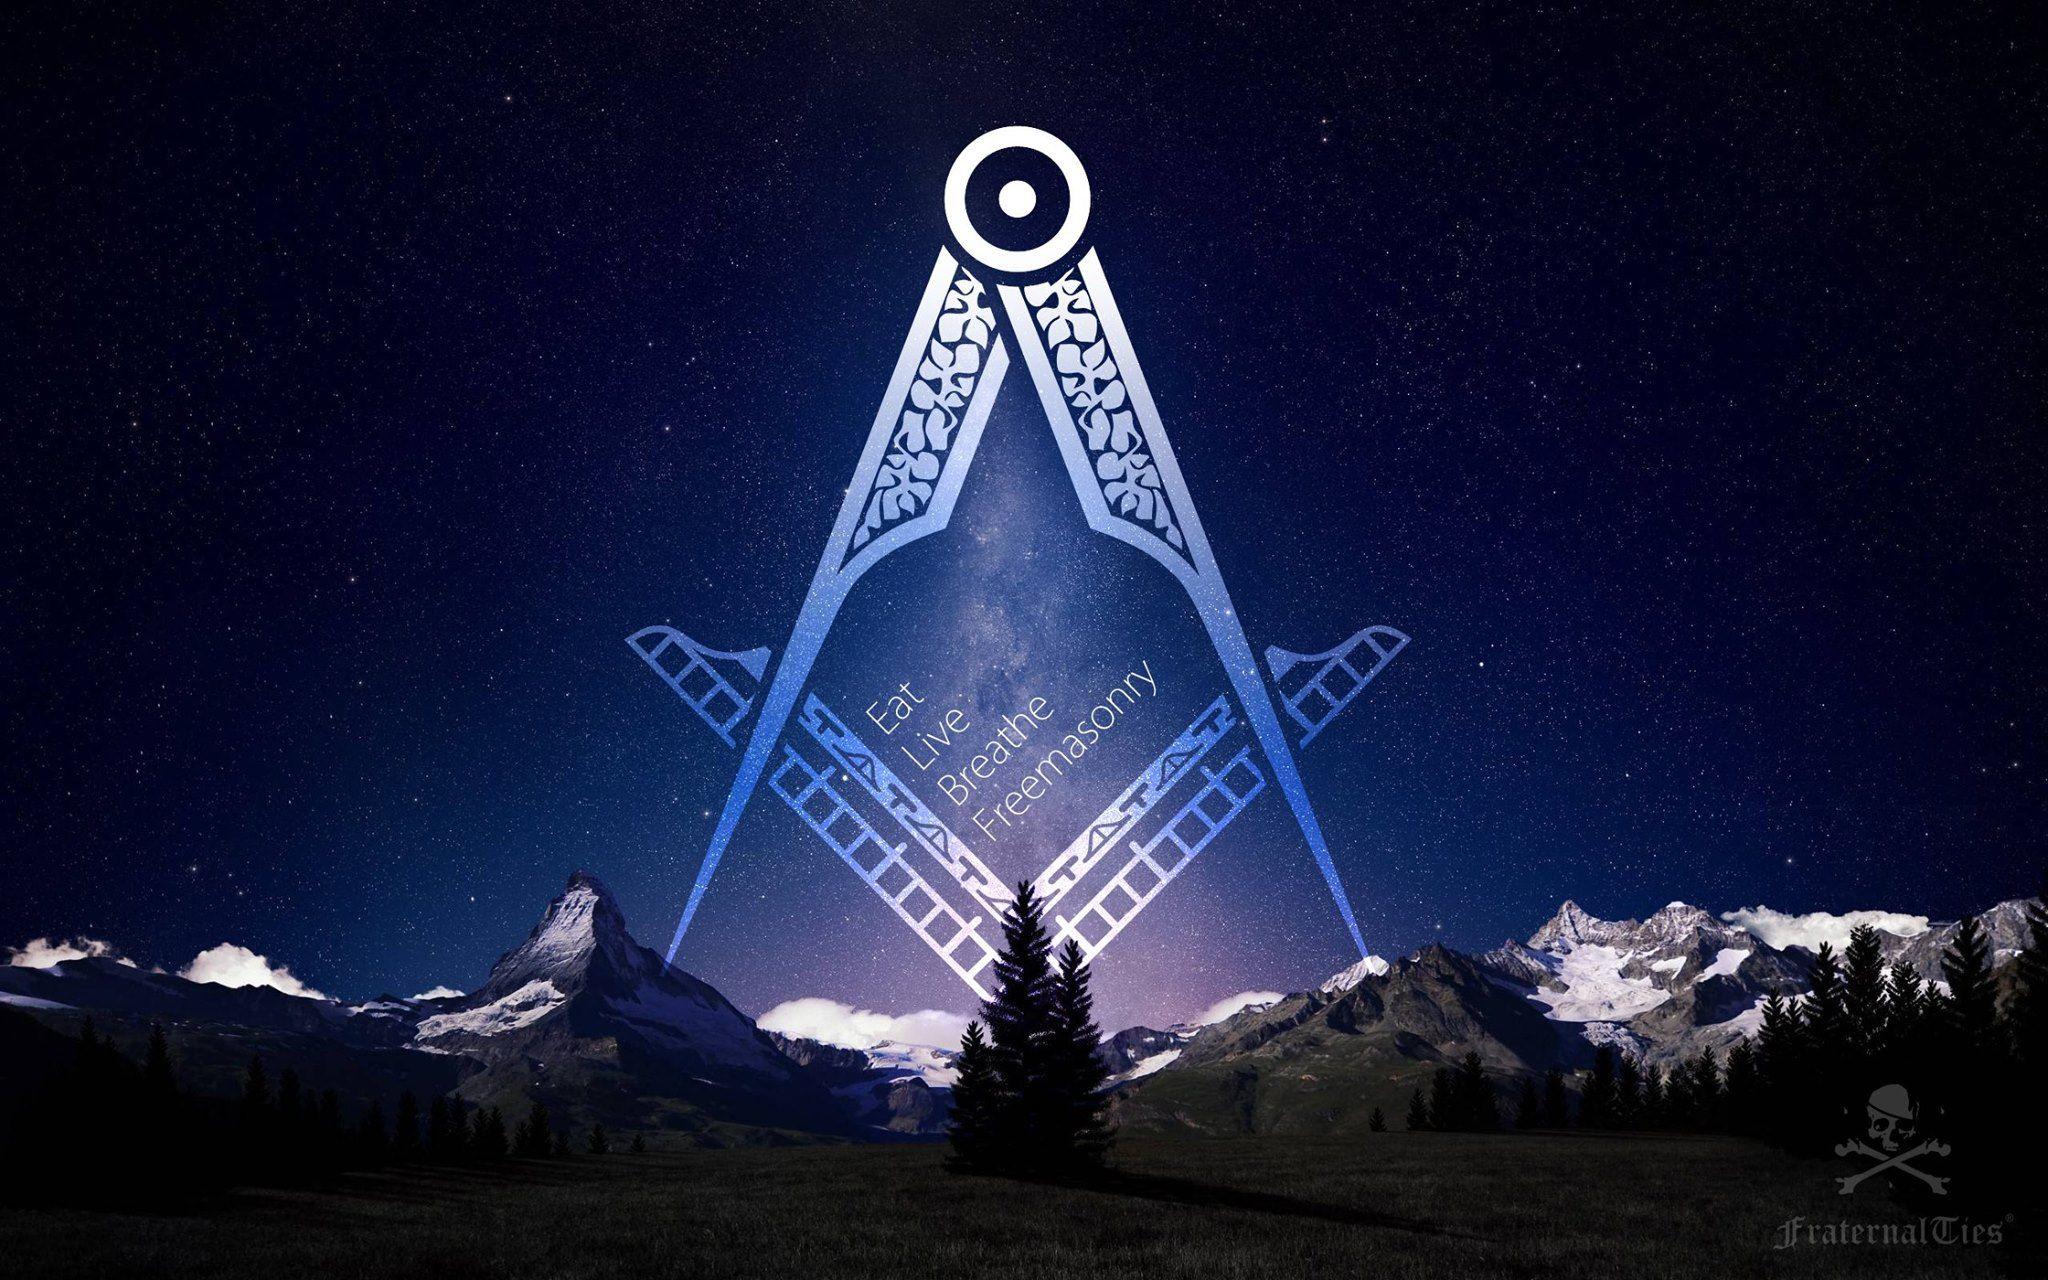 live freemasonry freemasonry pinterest freemasonry and knights